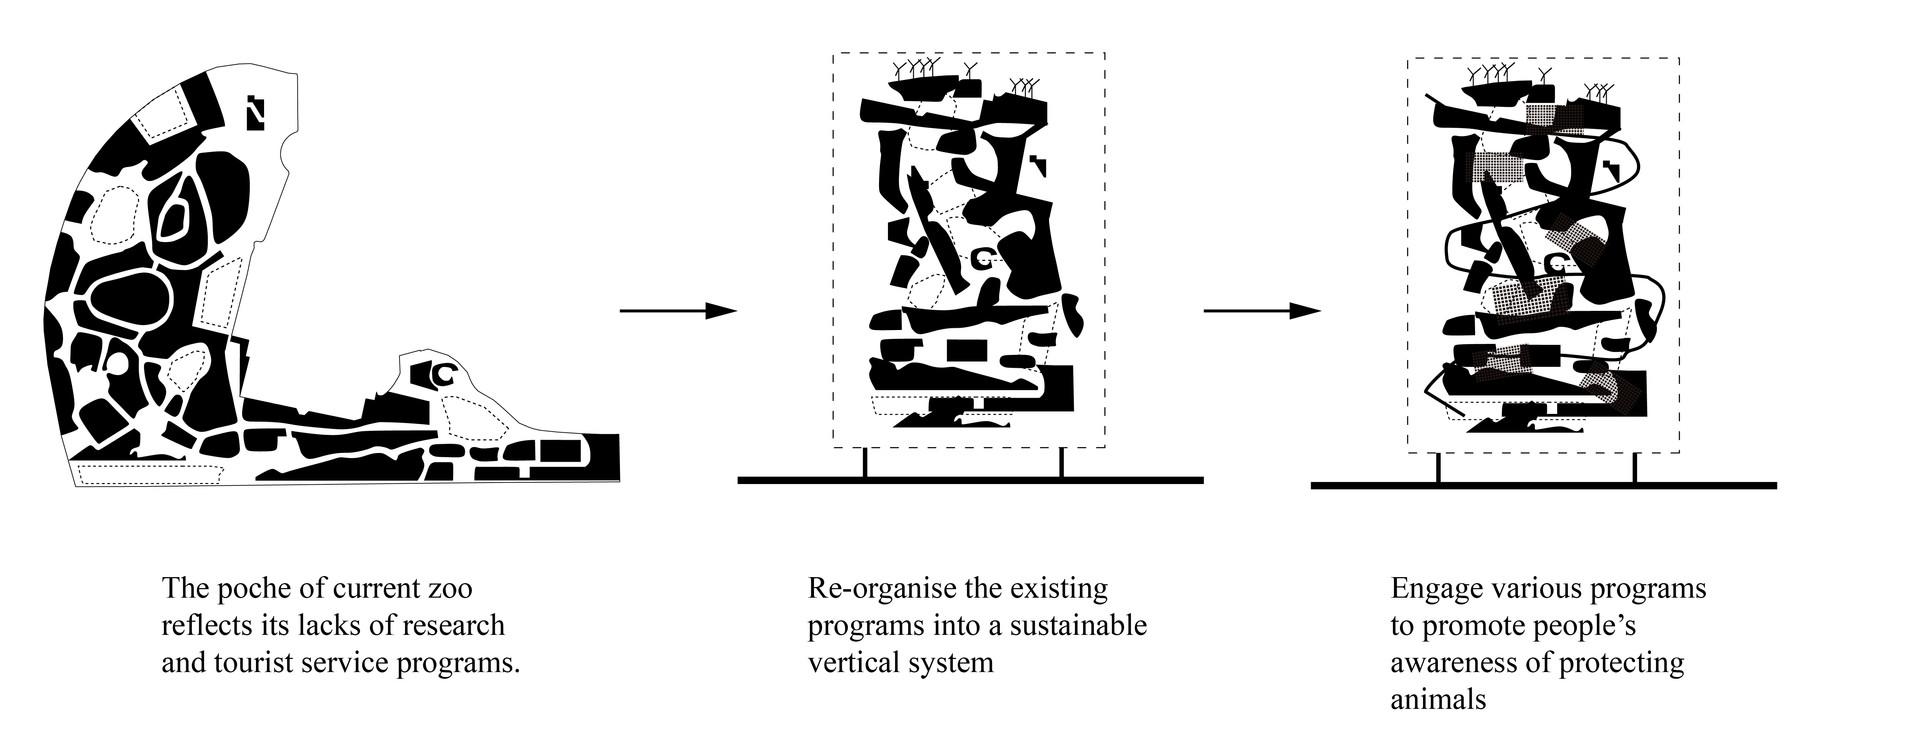 diagram plan [转换]-01.jpg